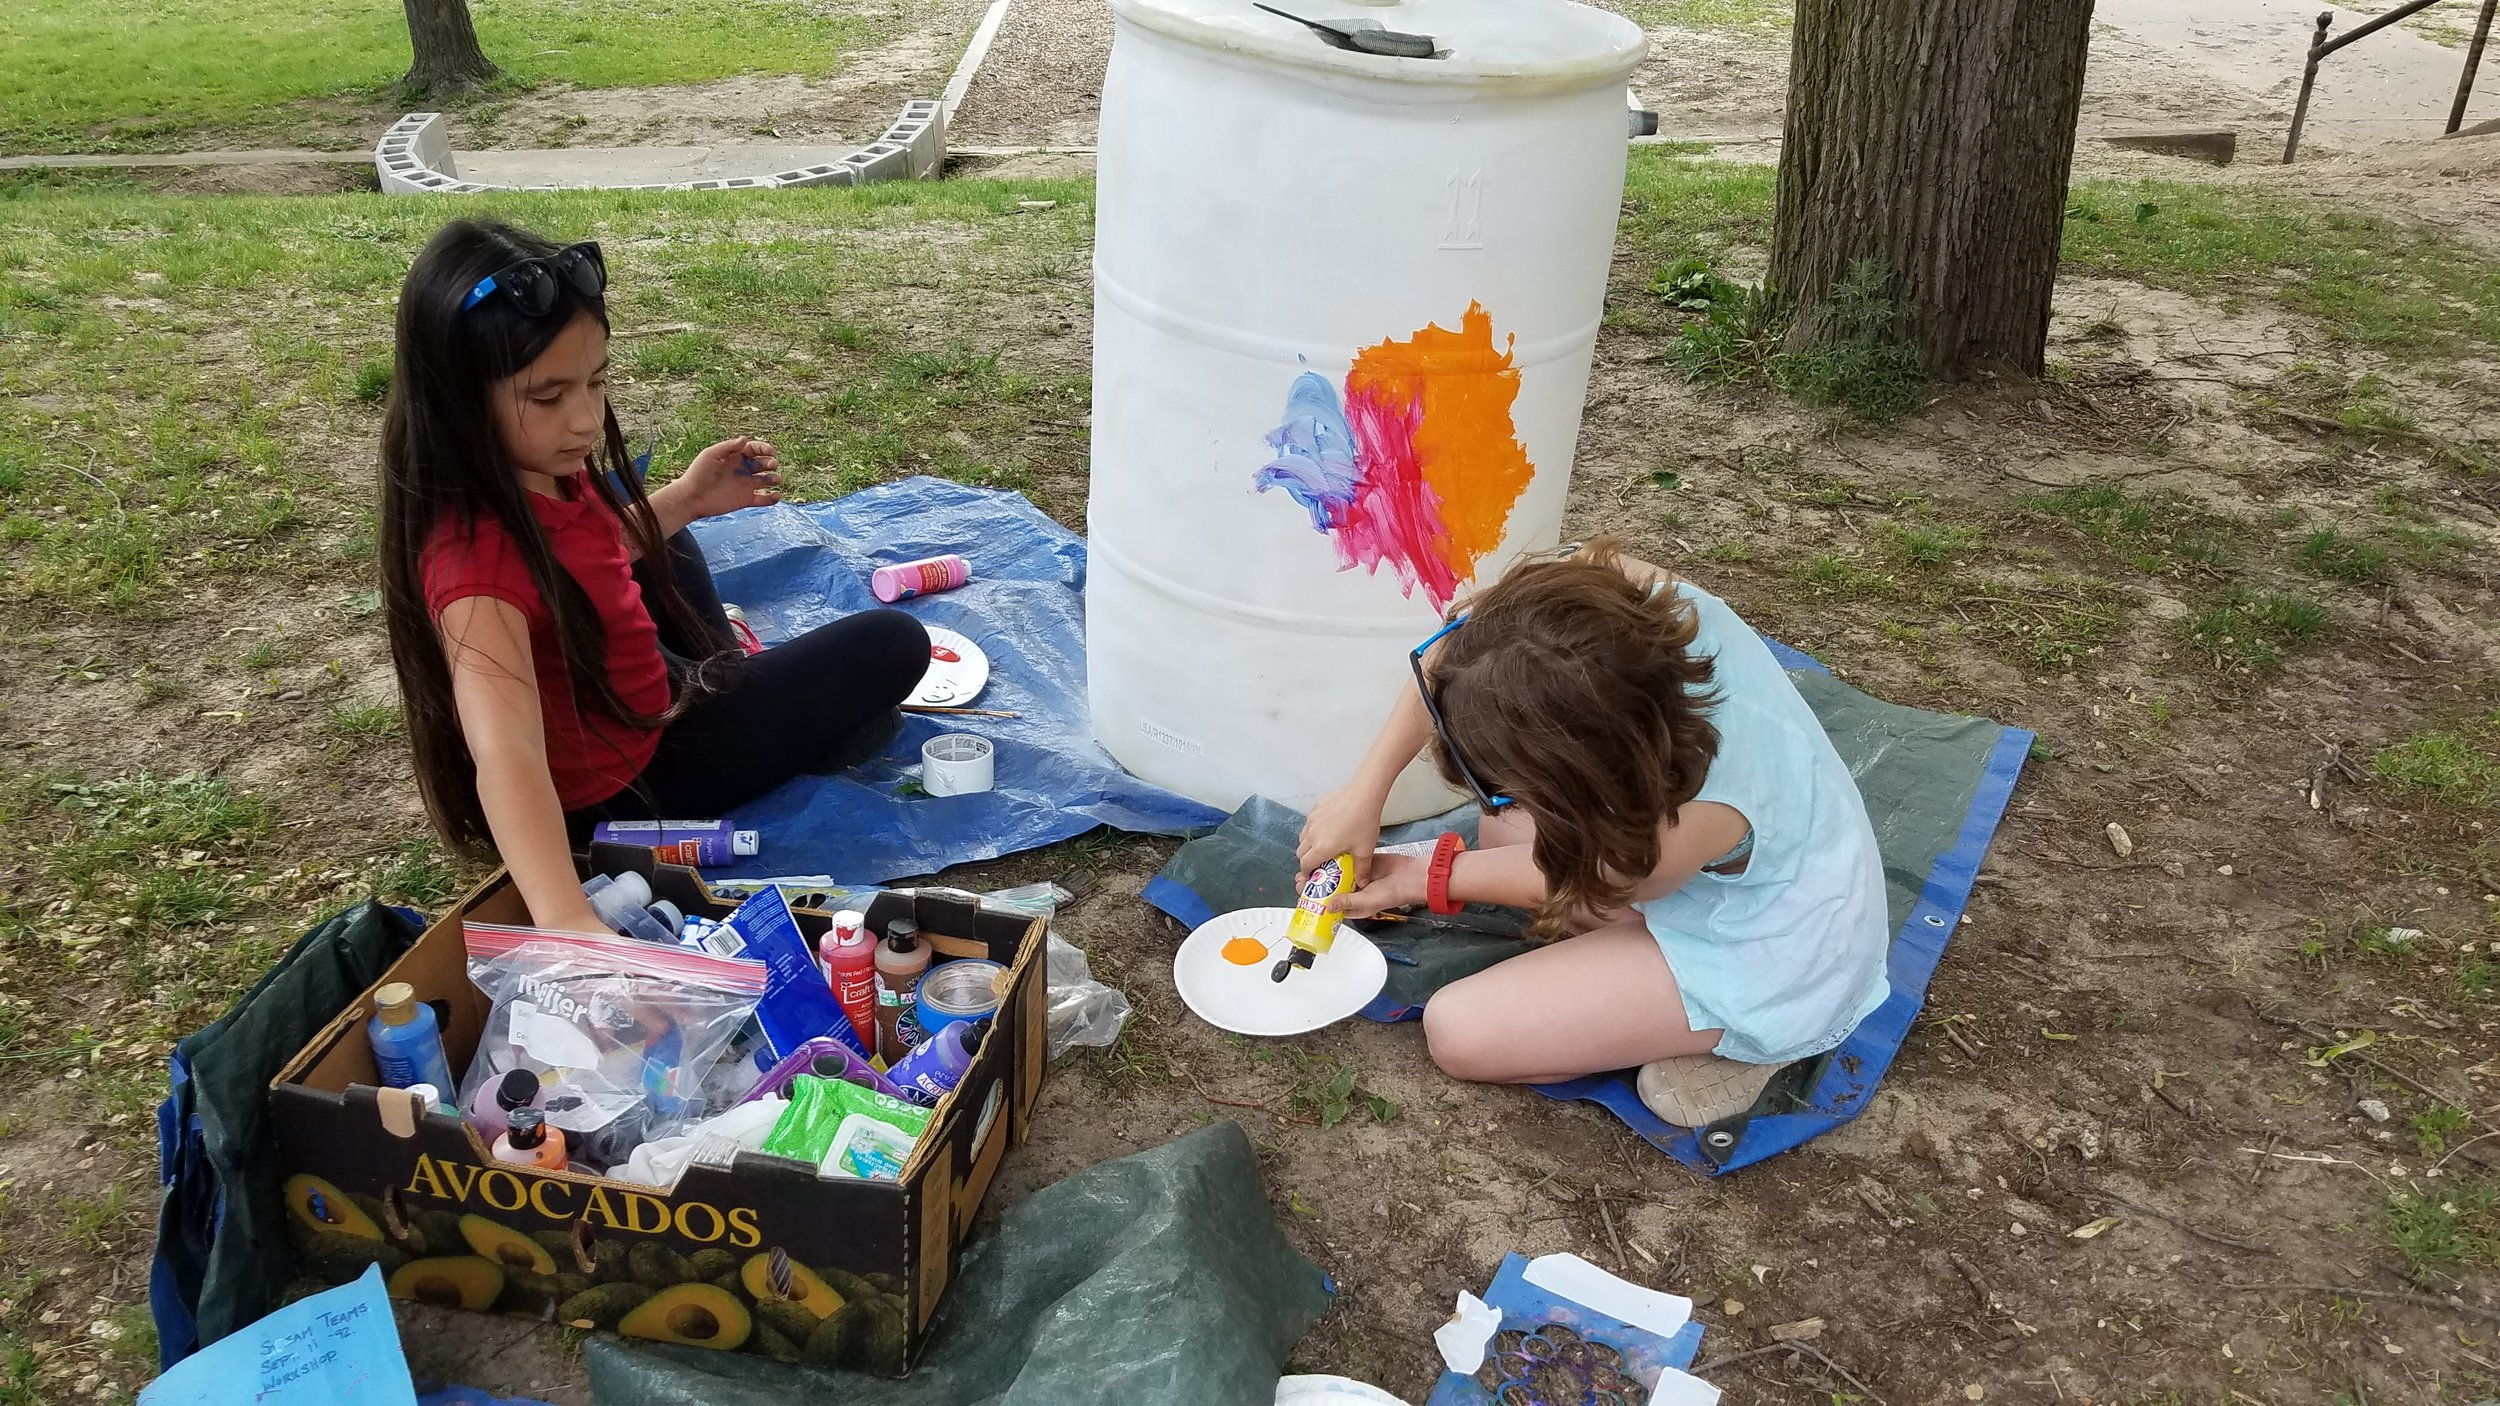 North Park Montessori Students Painting Rainbarrels at Workshop